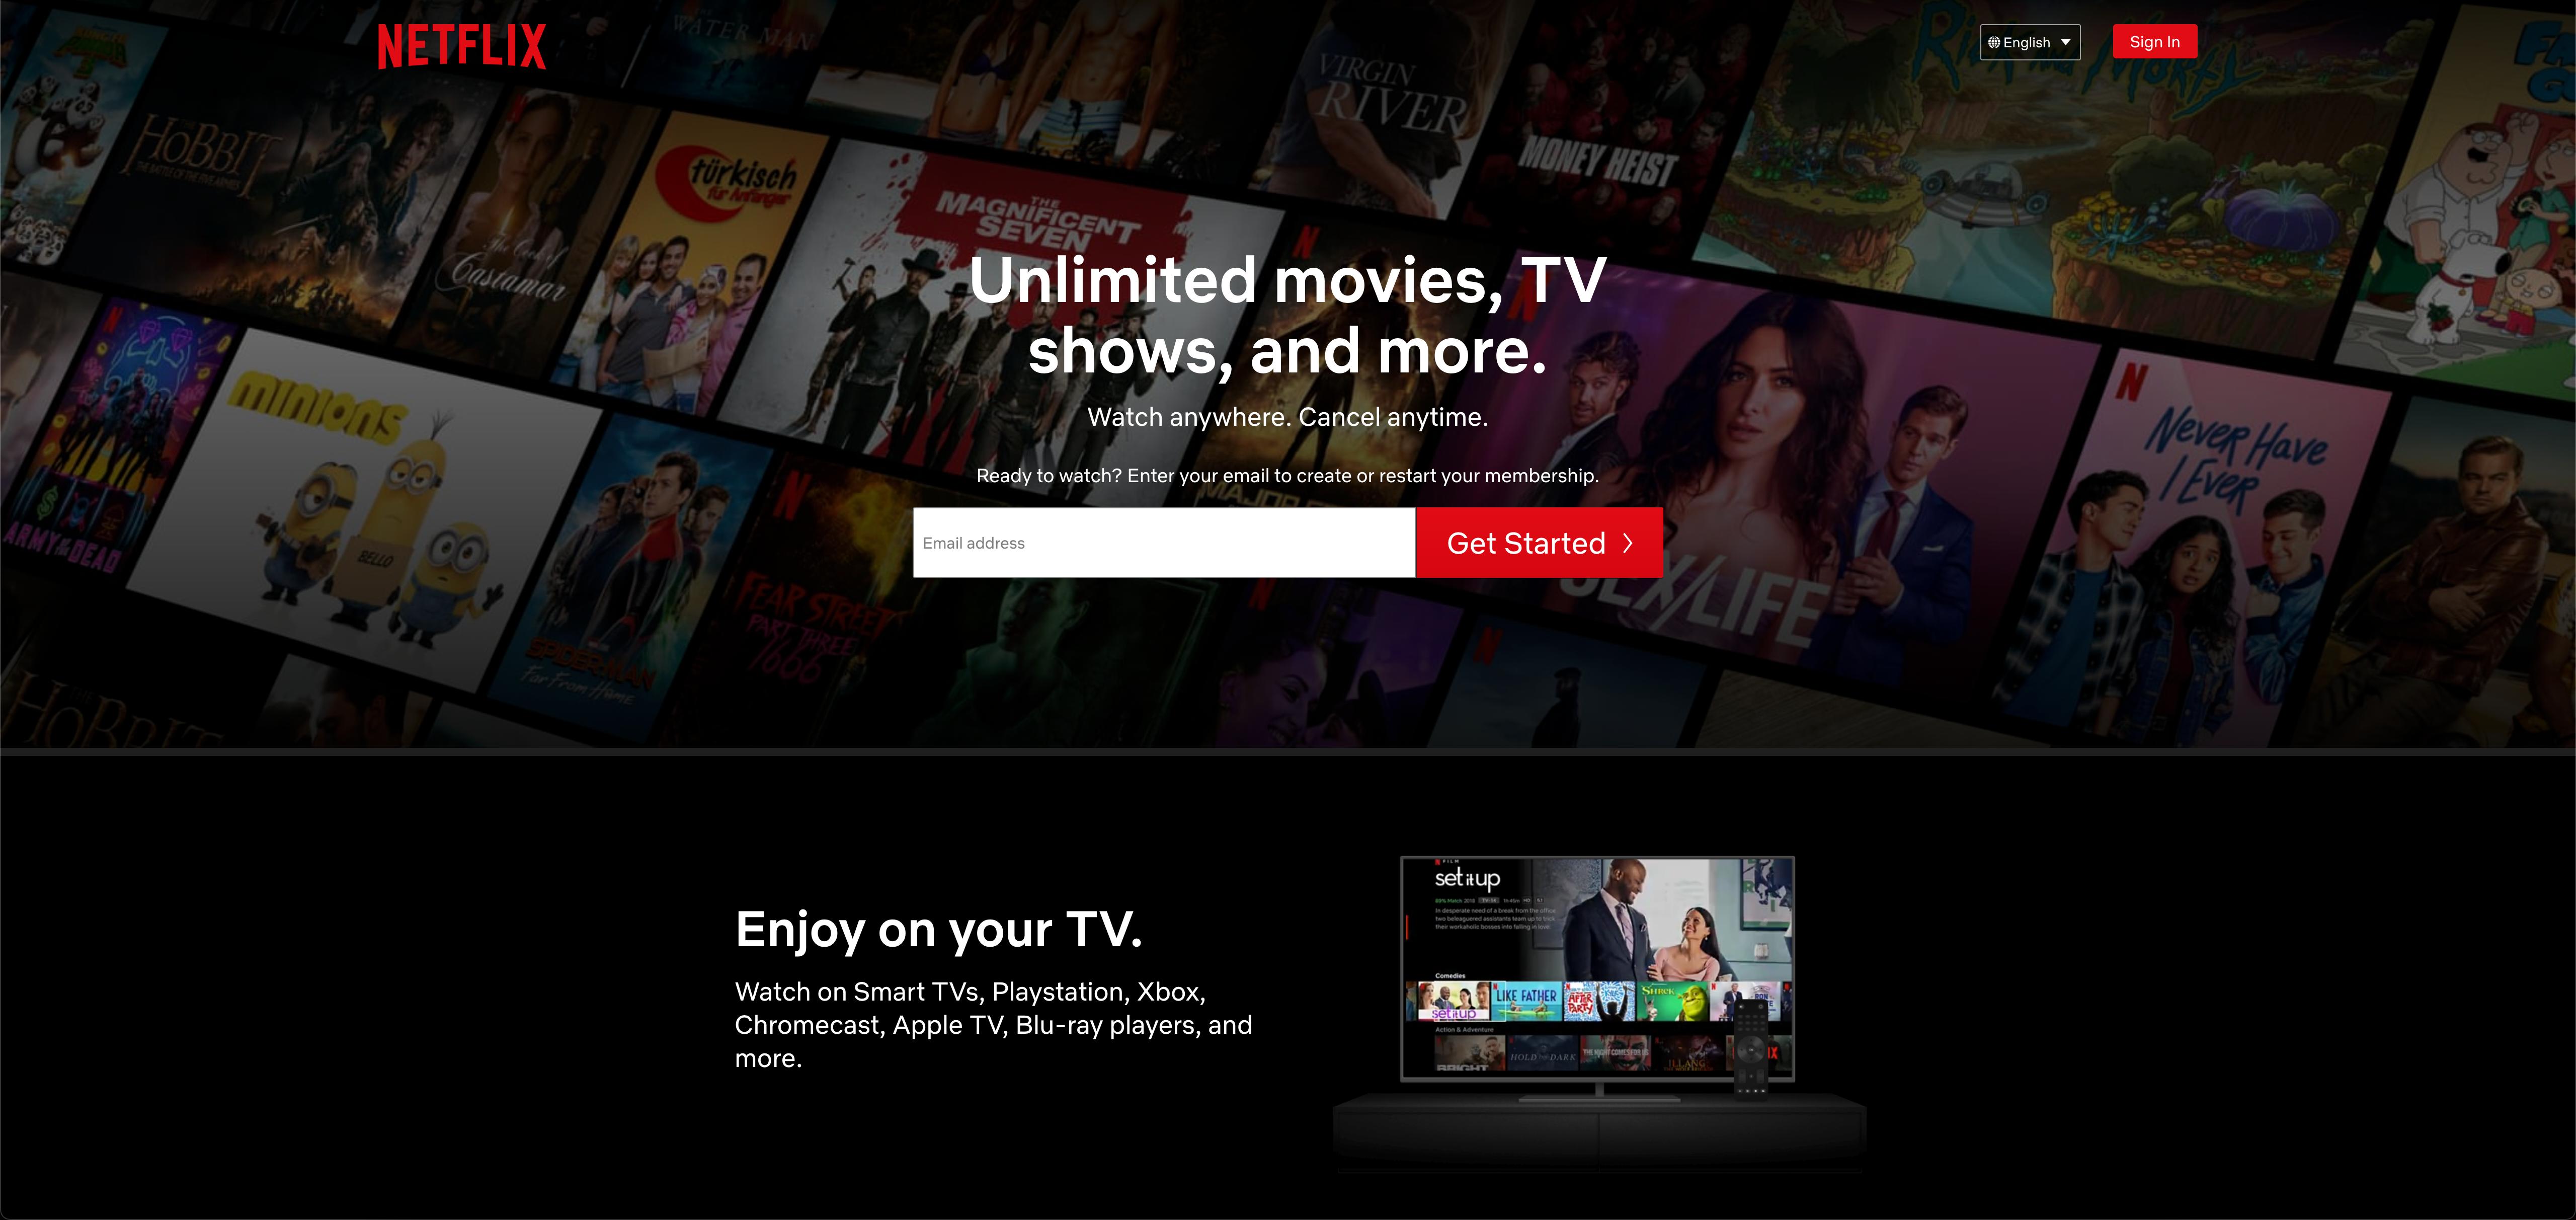 Buy Netflix Gift Cards Online